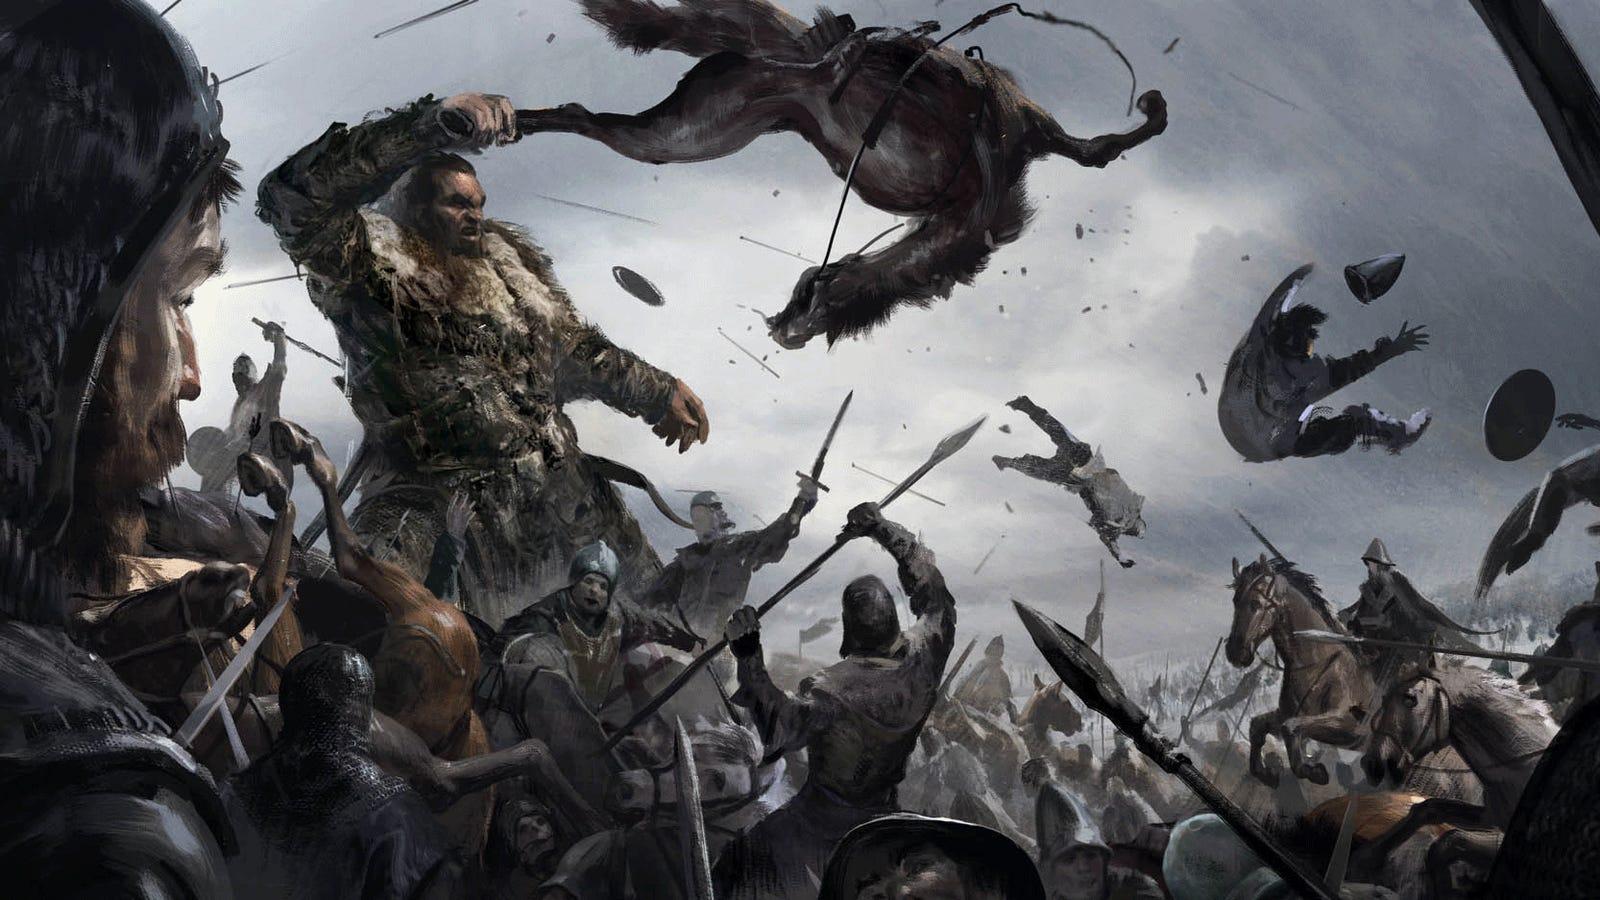 The Concept Art BehindGame Of Thrones: Season 6